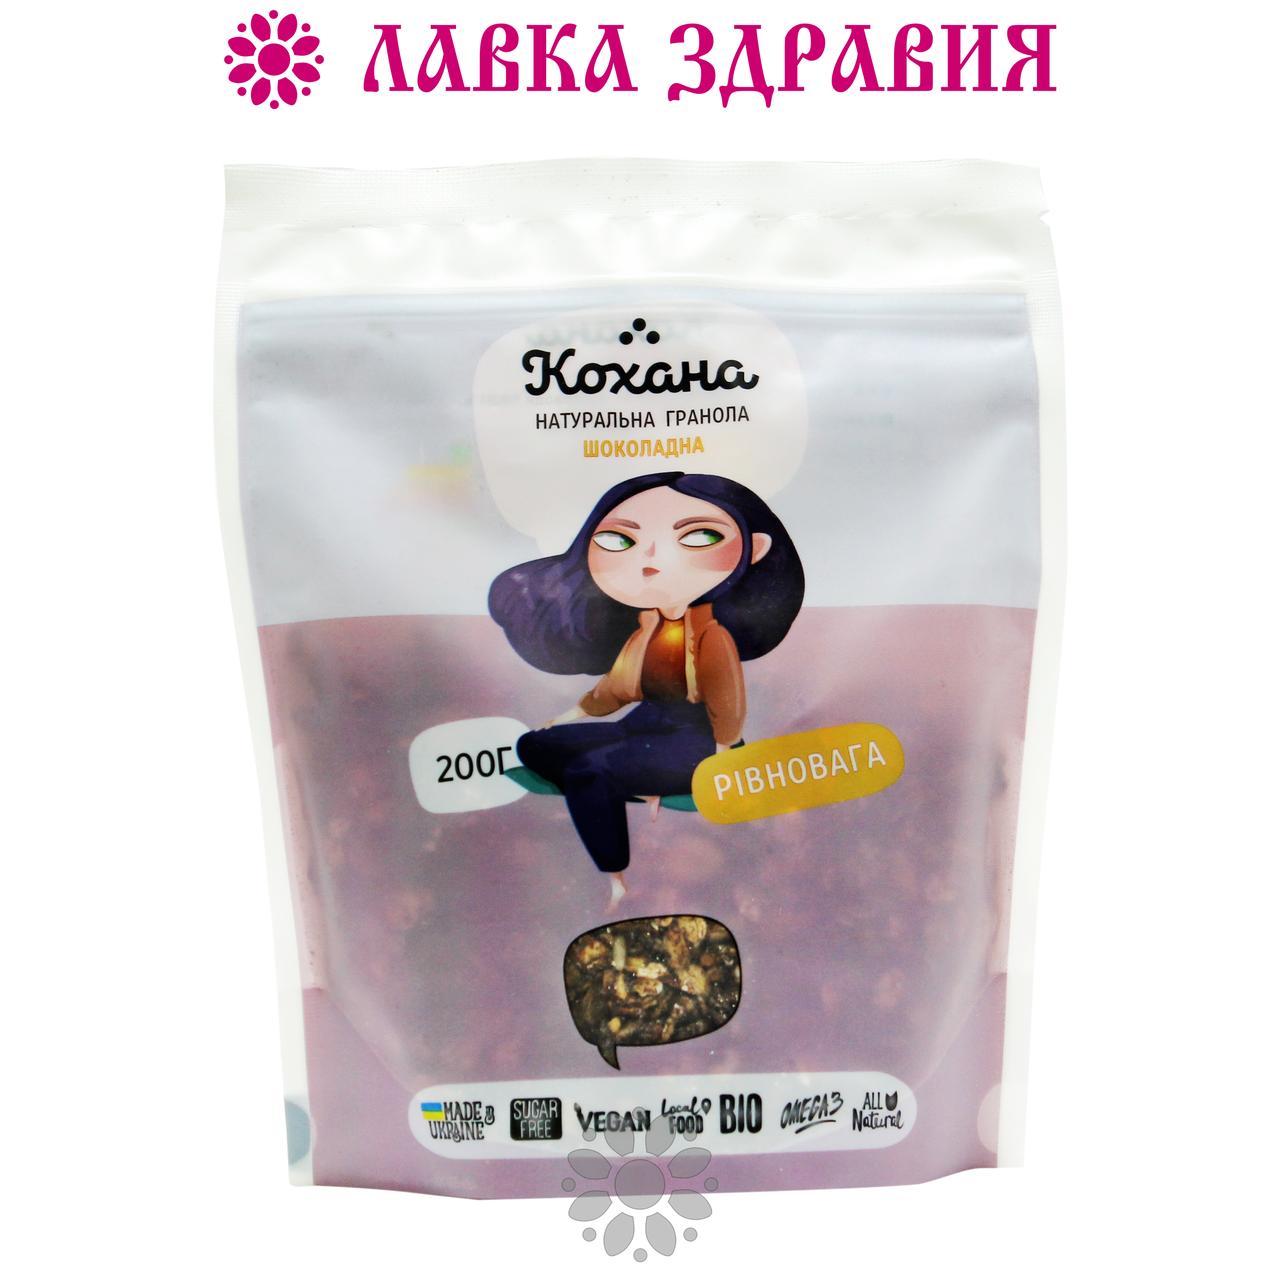 Гранола Шоколадная, 200 г, Кохана